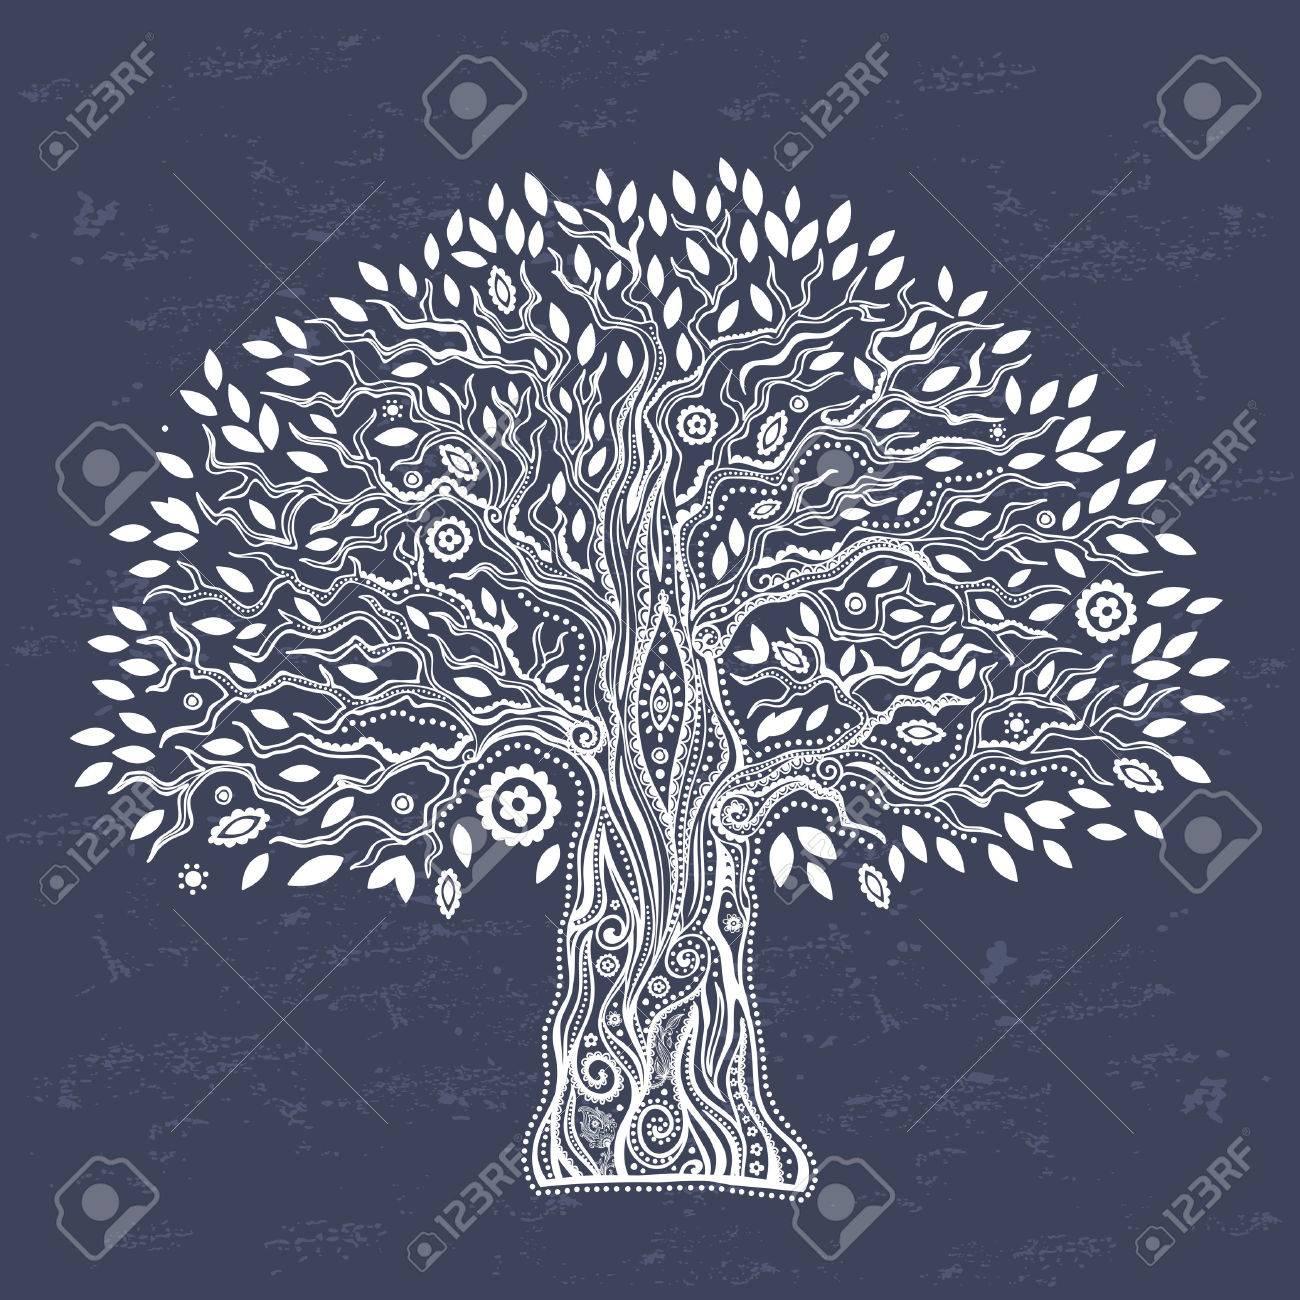 Beautiful Unique ethnic tree of life illustration - 43881304